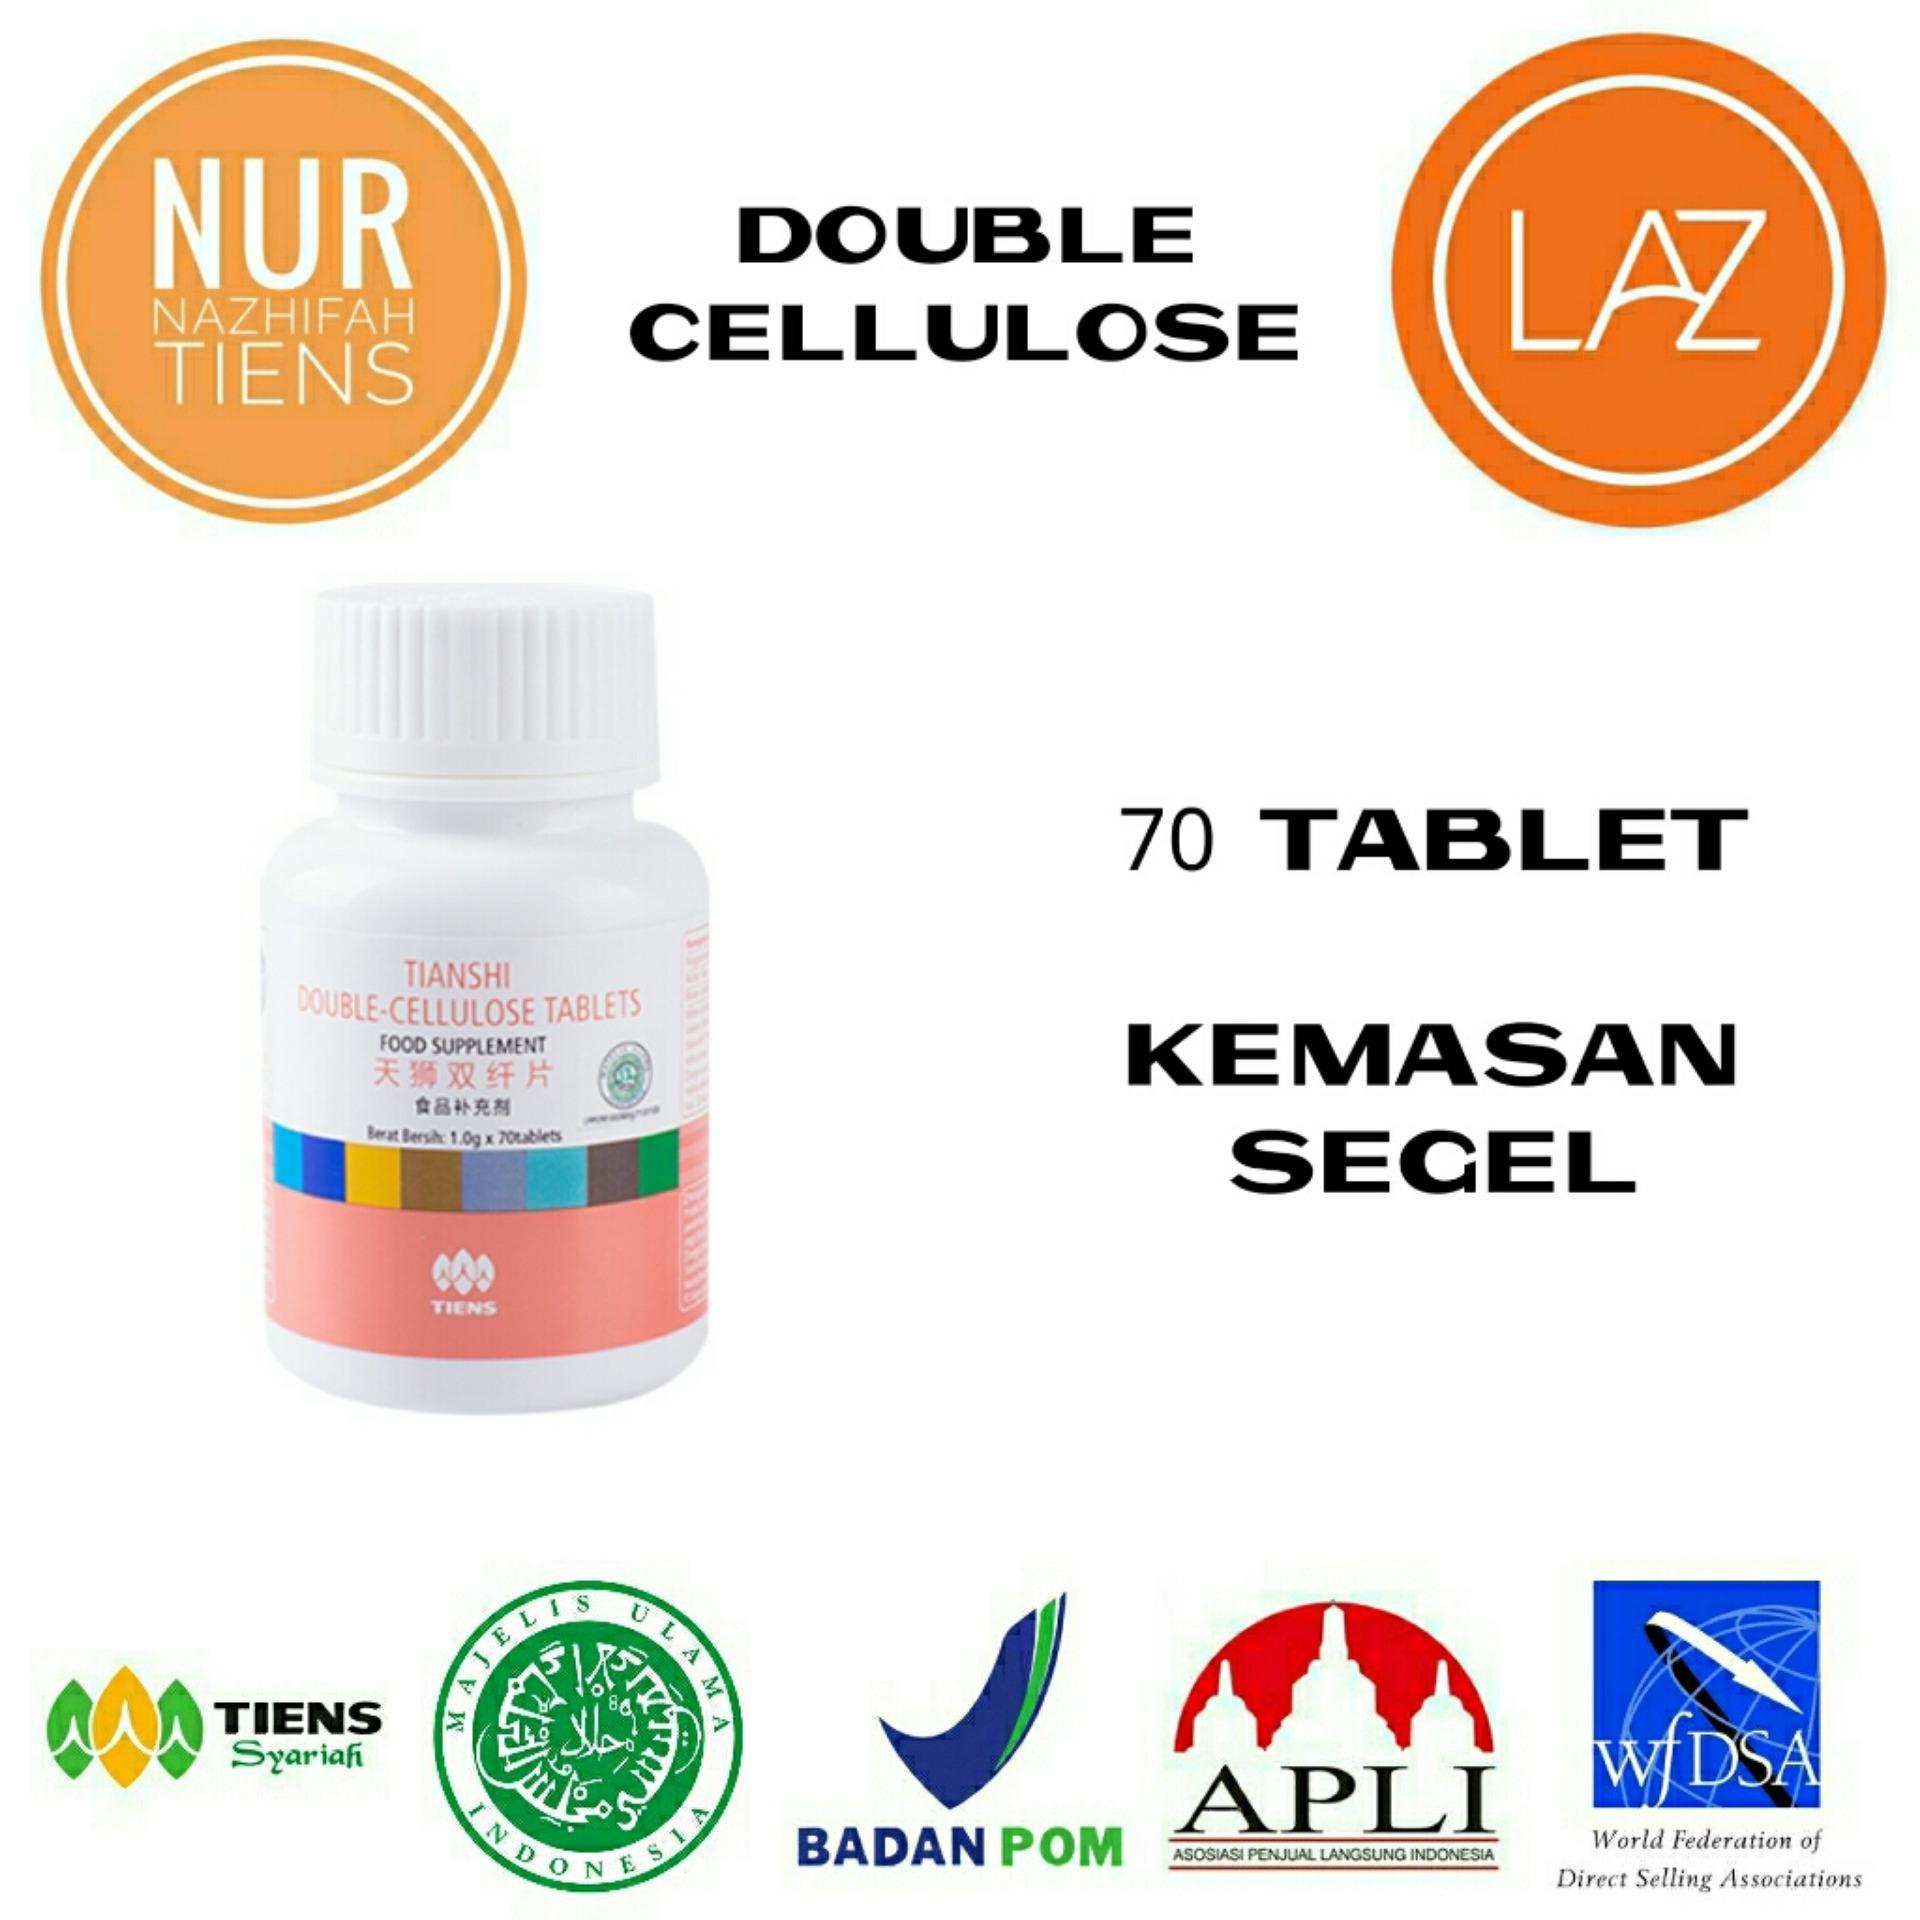 Tiens Double Cellulose Pelancar Sembelit 70 Tablet Daftar Update Tablets Rp 274 900 Serat Ganda Obat Herbal Wasir Ambeien Dan Pencernaan Promo Paket